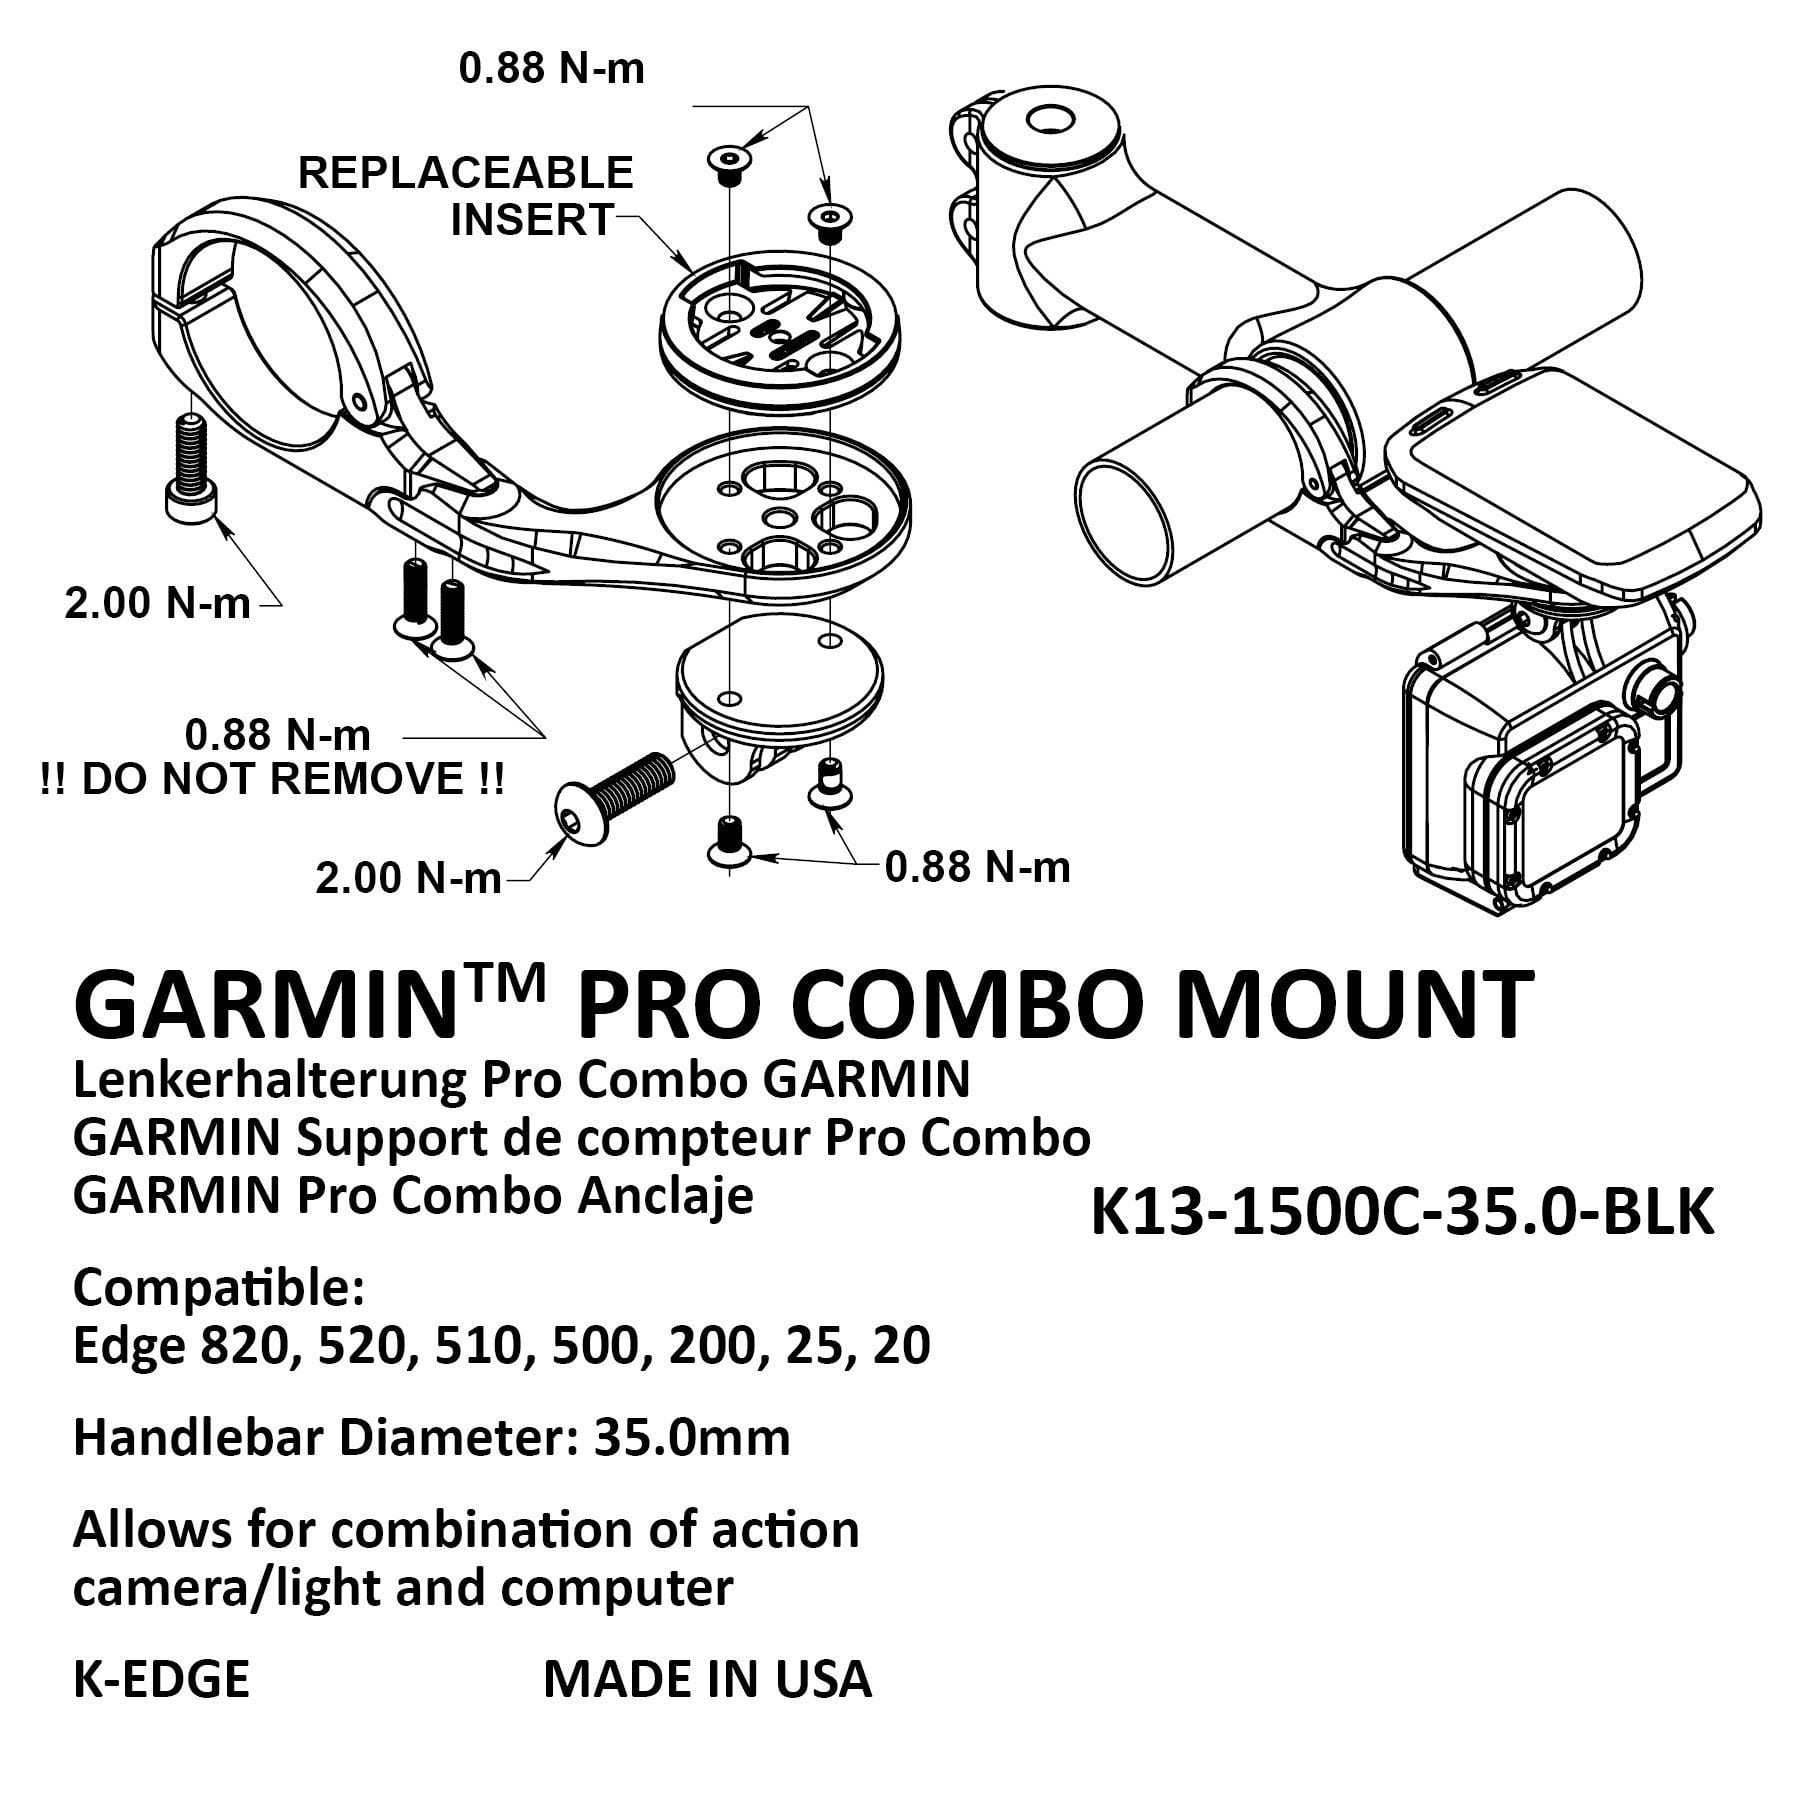 New 2019 K-Edge Combo Garmin Go Pro Camera Mount 31.8 Black K Edge